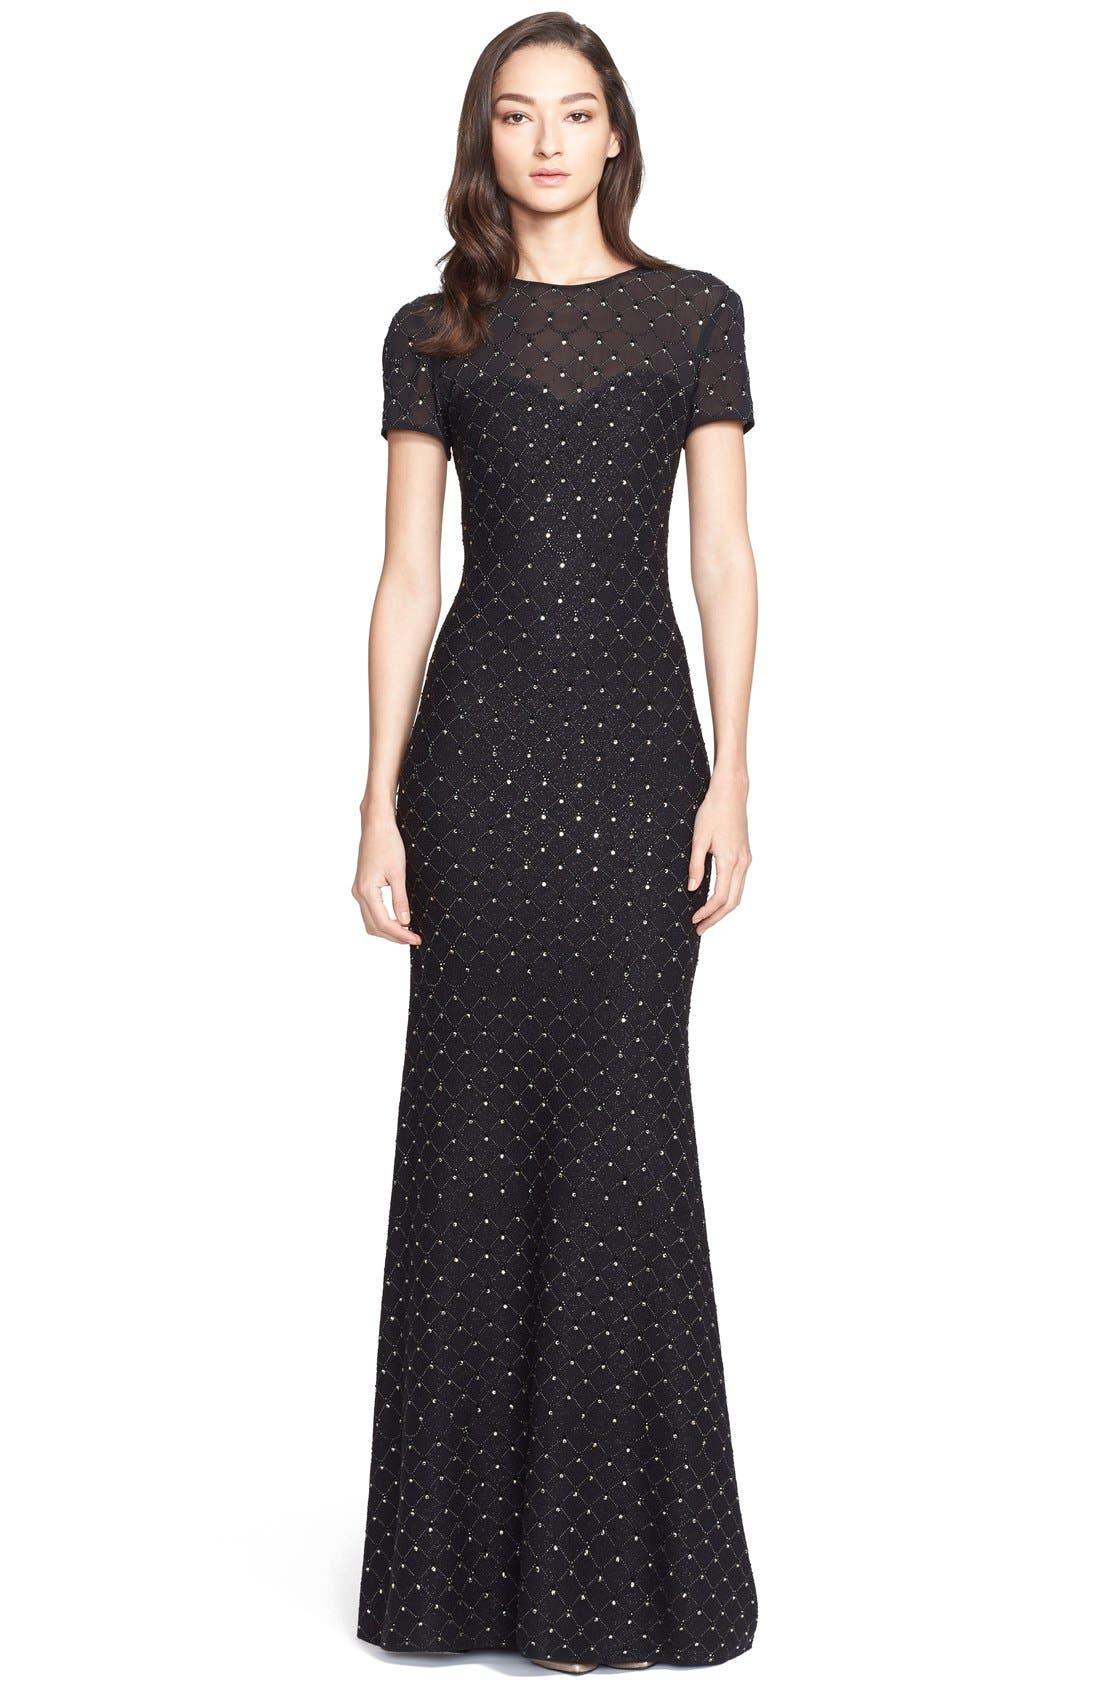 Main Image - St. John Collection Embellished Shimmer Knit Gown